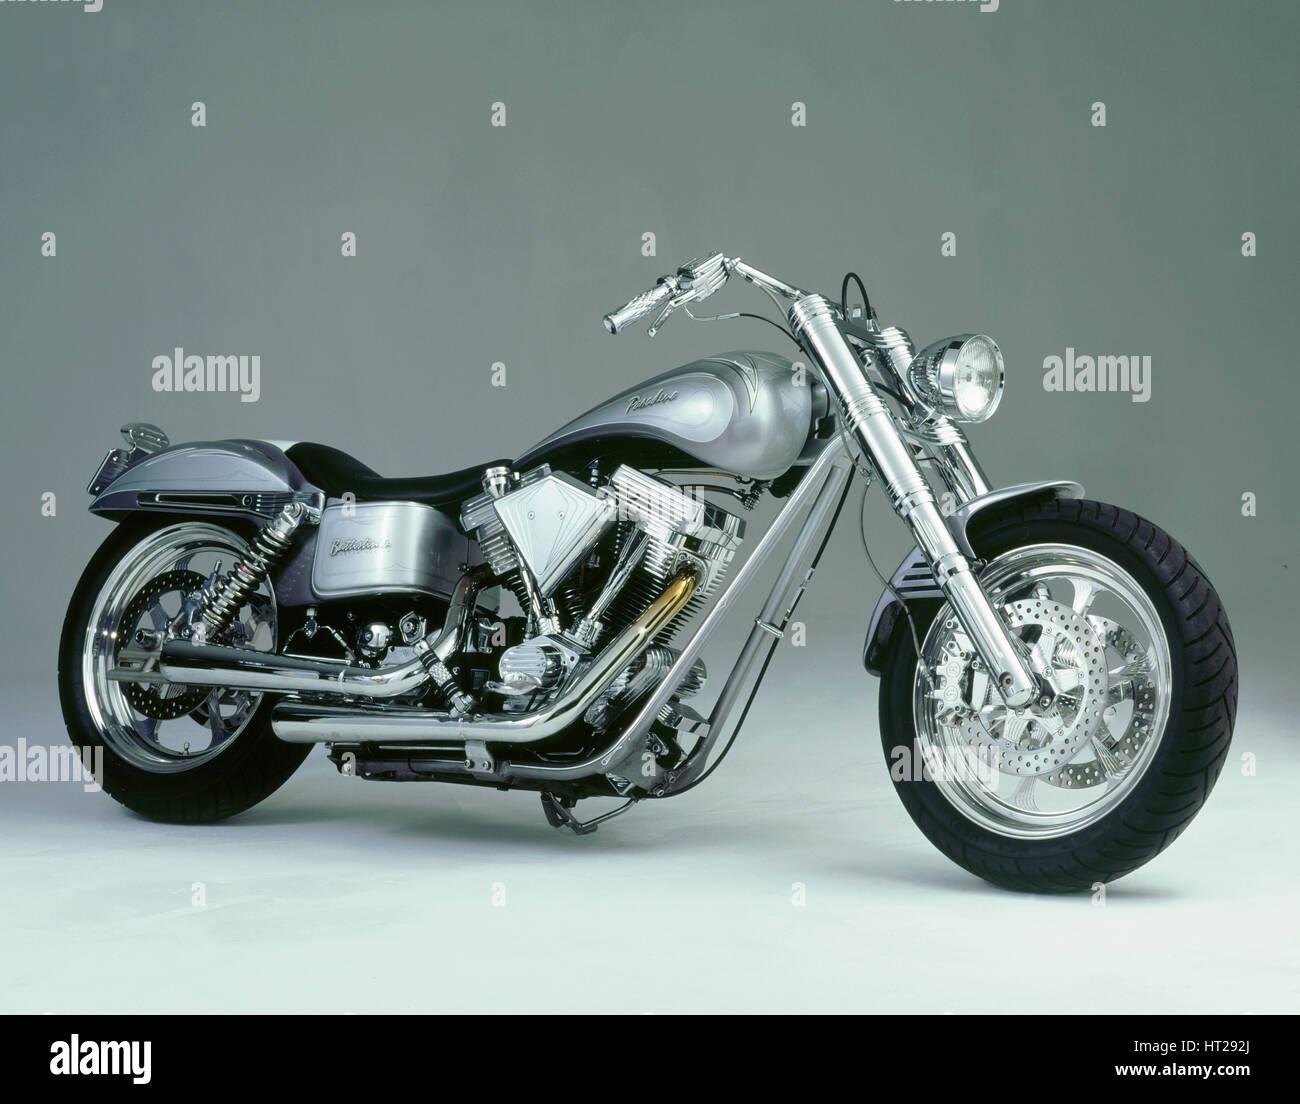 1996 Harley Davidson Pasadena by Battistinis custom conversions. Artist: Unknown. - Stock Image